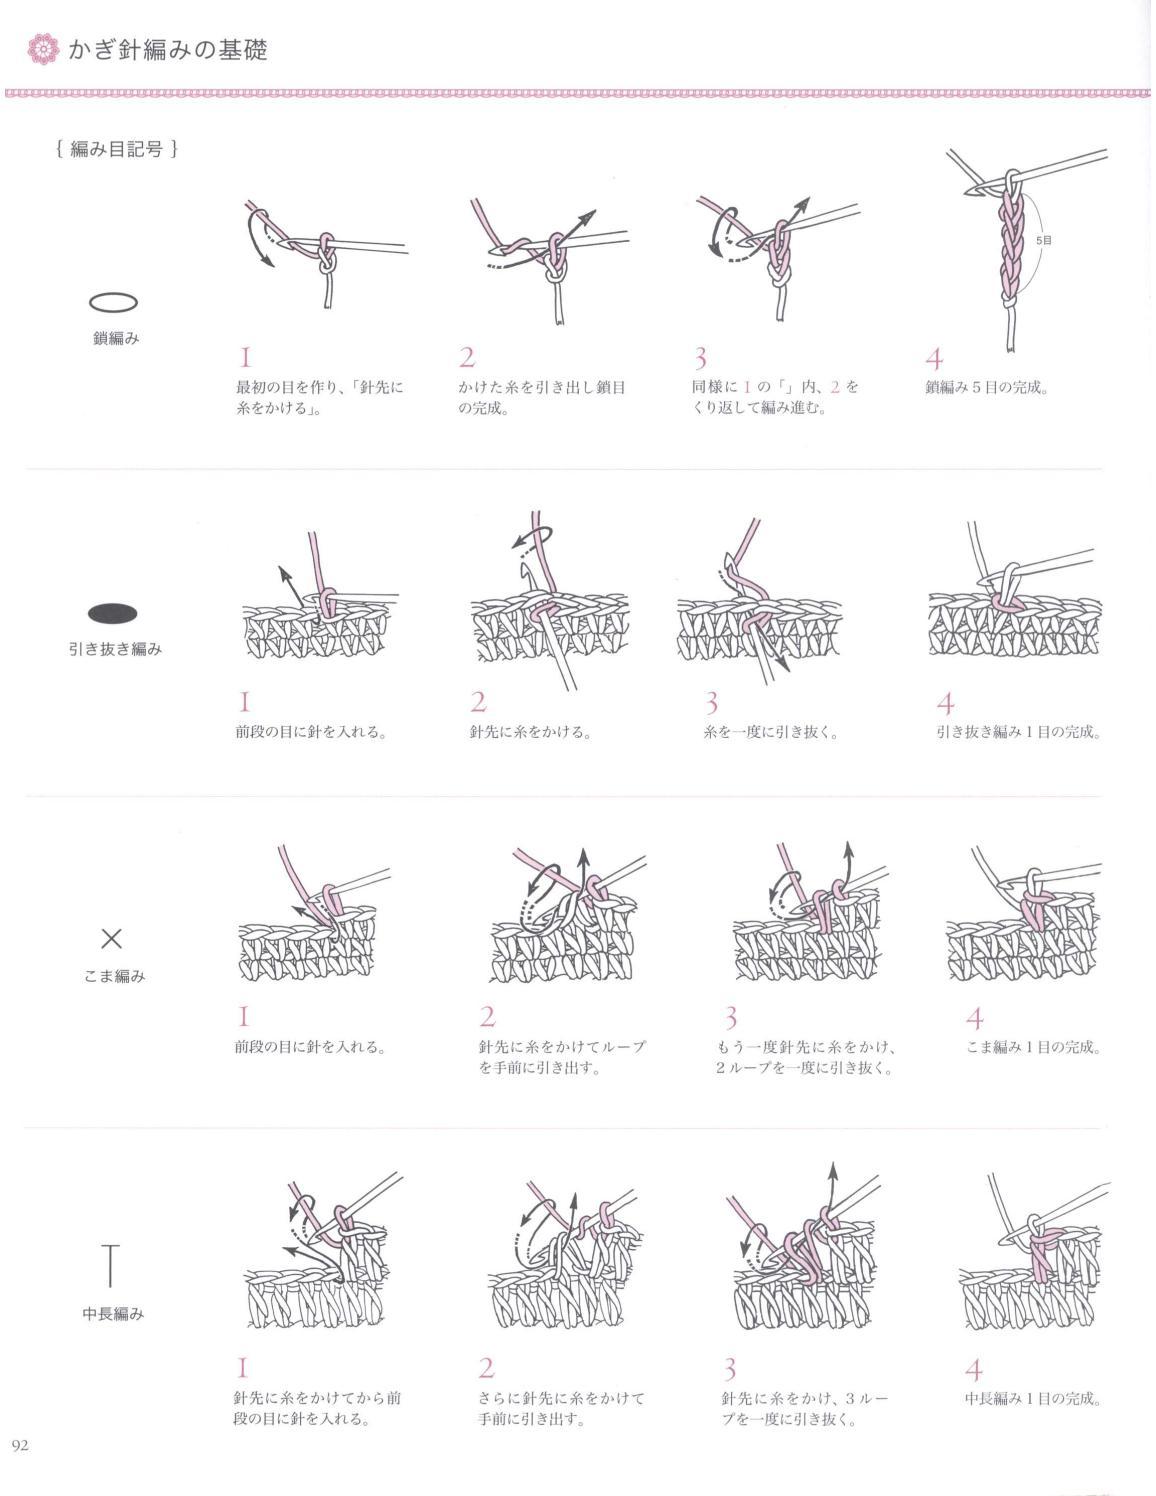 Asahi original crochet best selection 2012 page 92